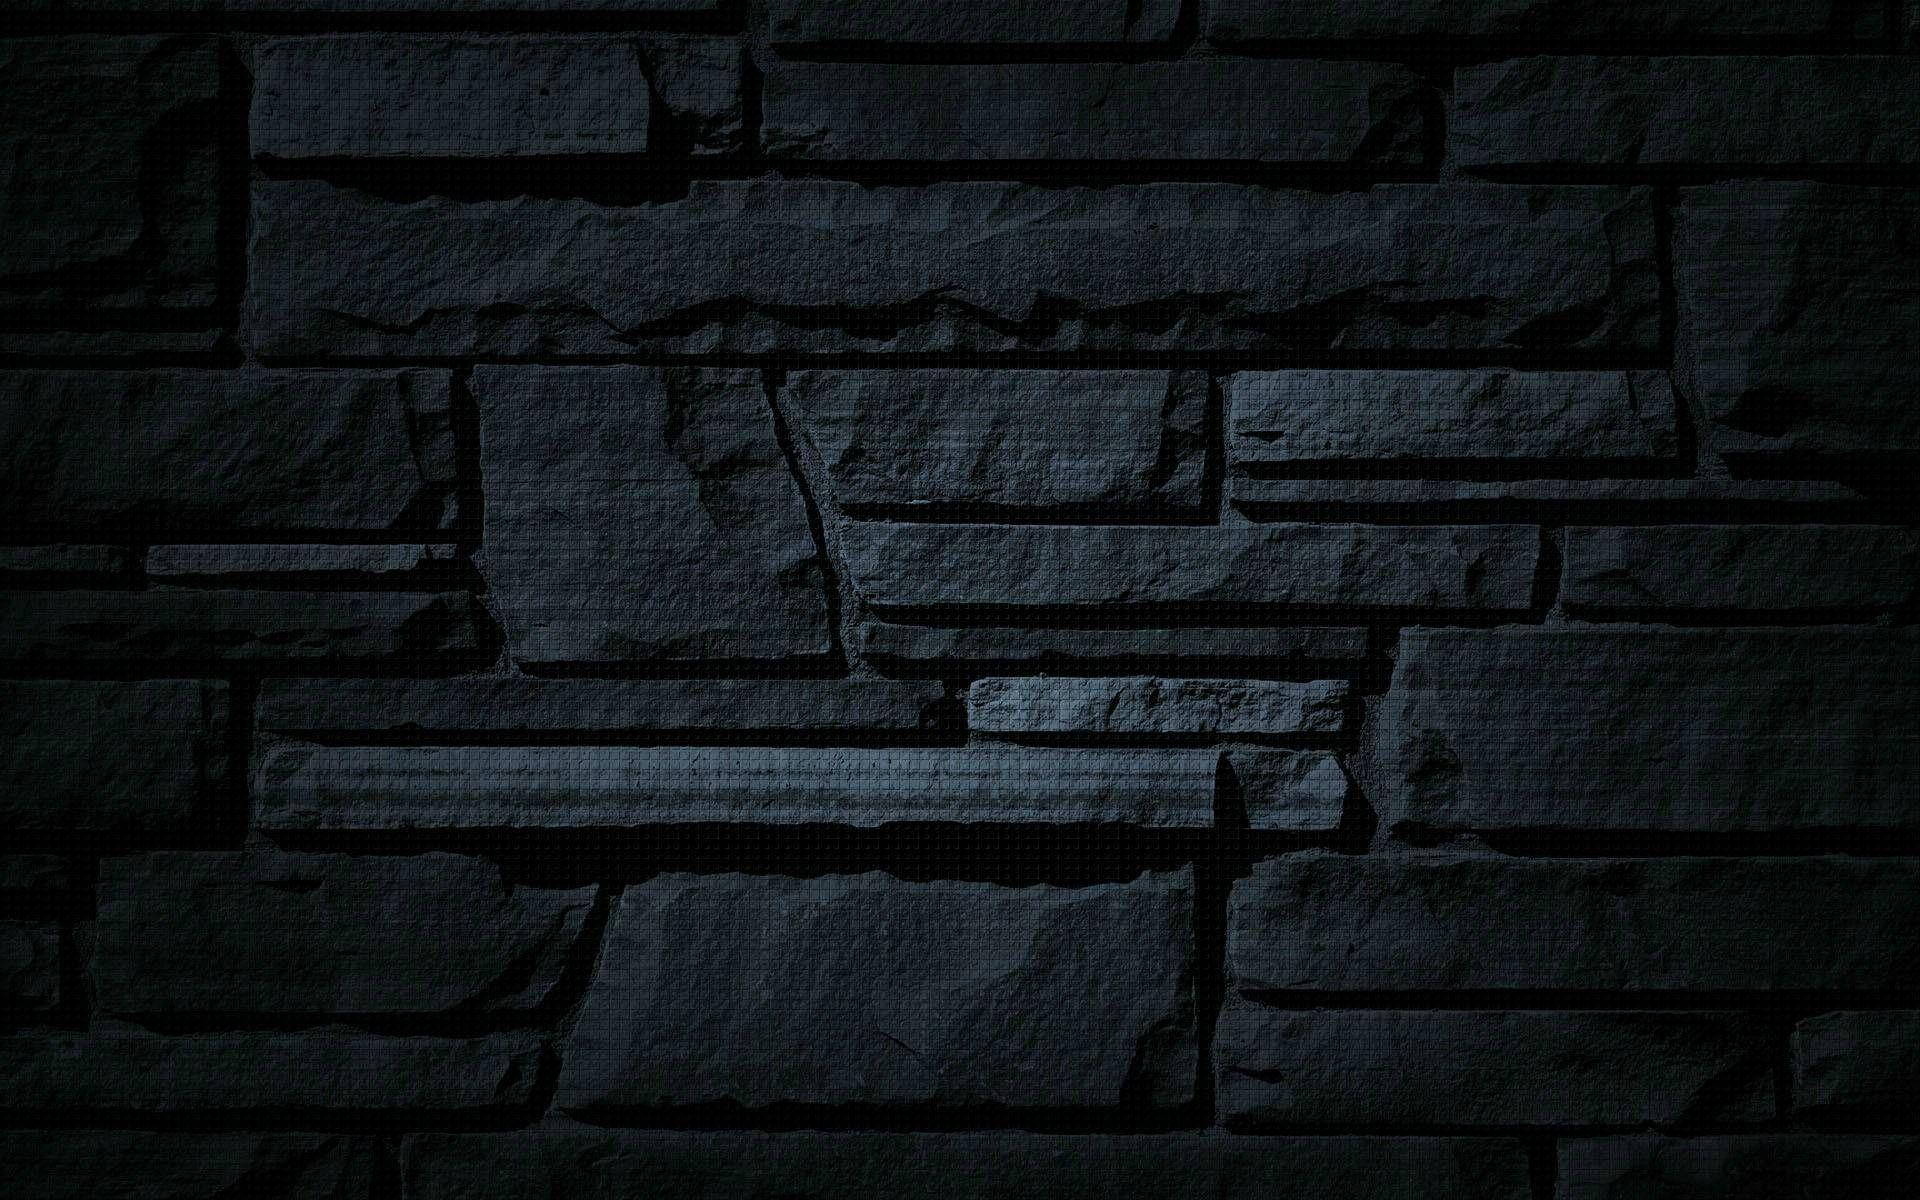 High Definition Mobile Phone And Desktop Wallpapers Black Brick Wallpaper Black Hd Wallpaper Brick Wallpaper